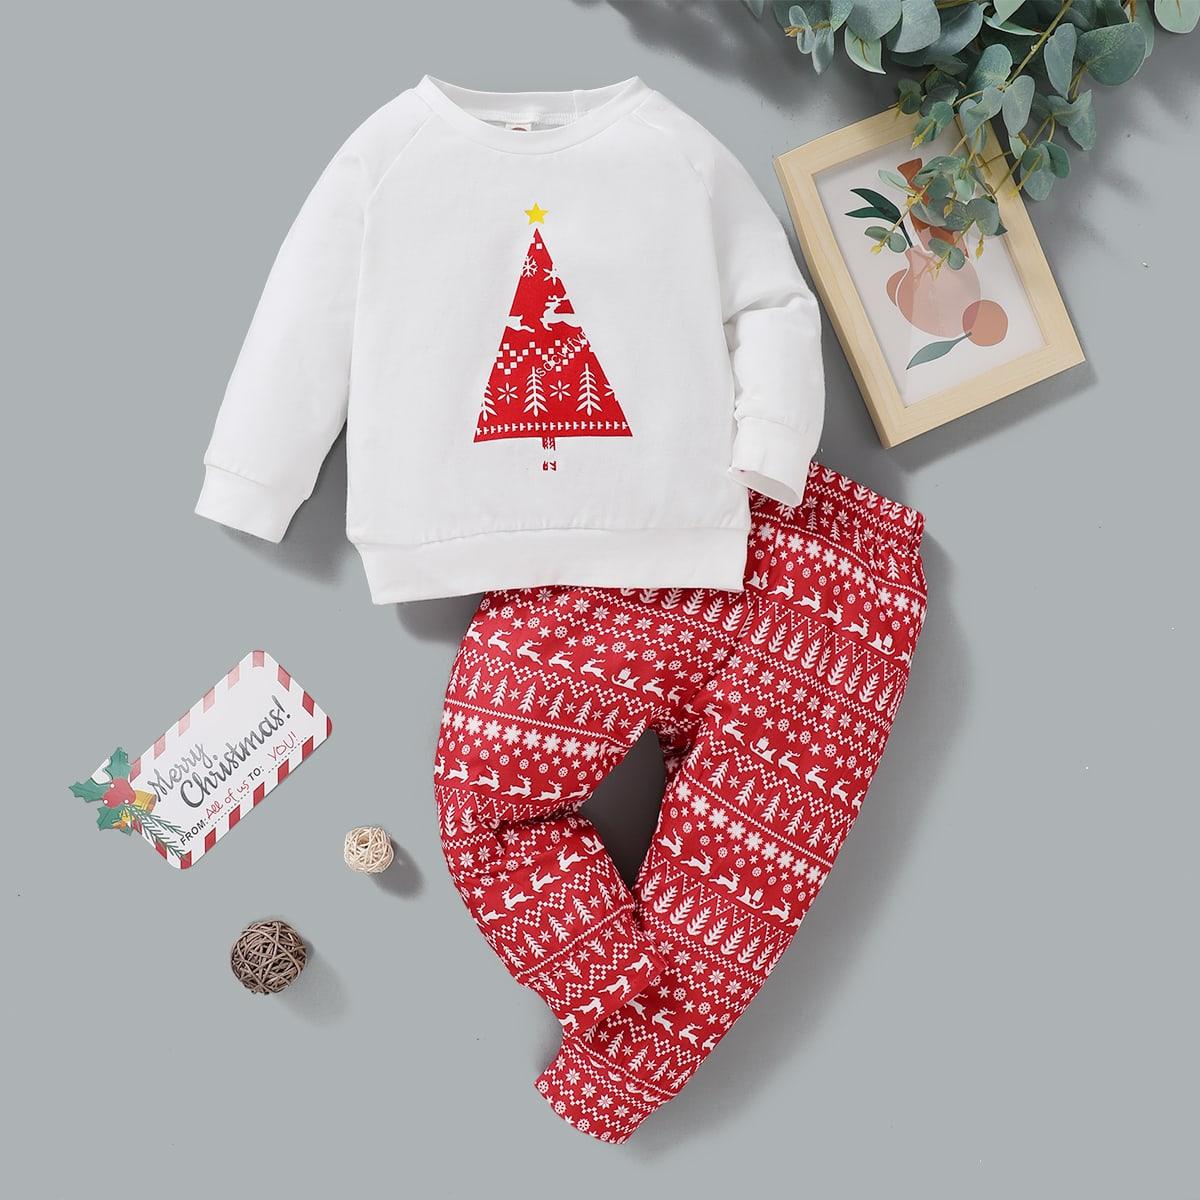 shein Casual Kerstmis Baby-setjes